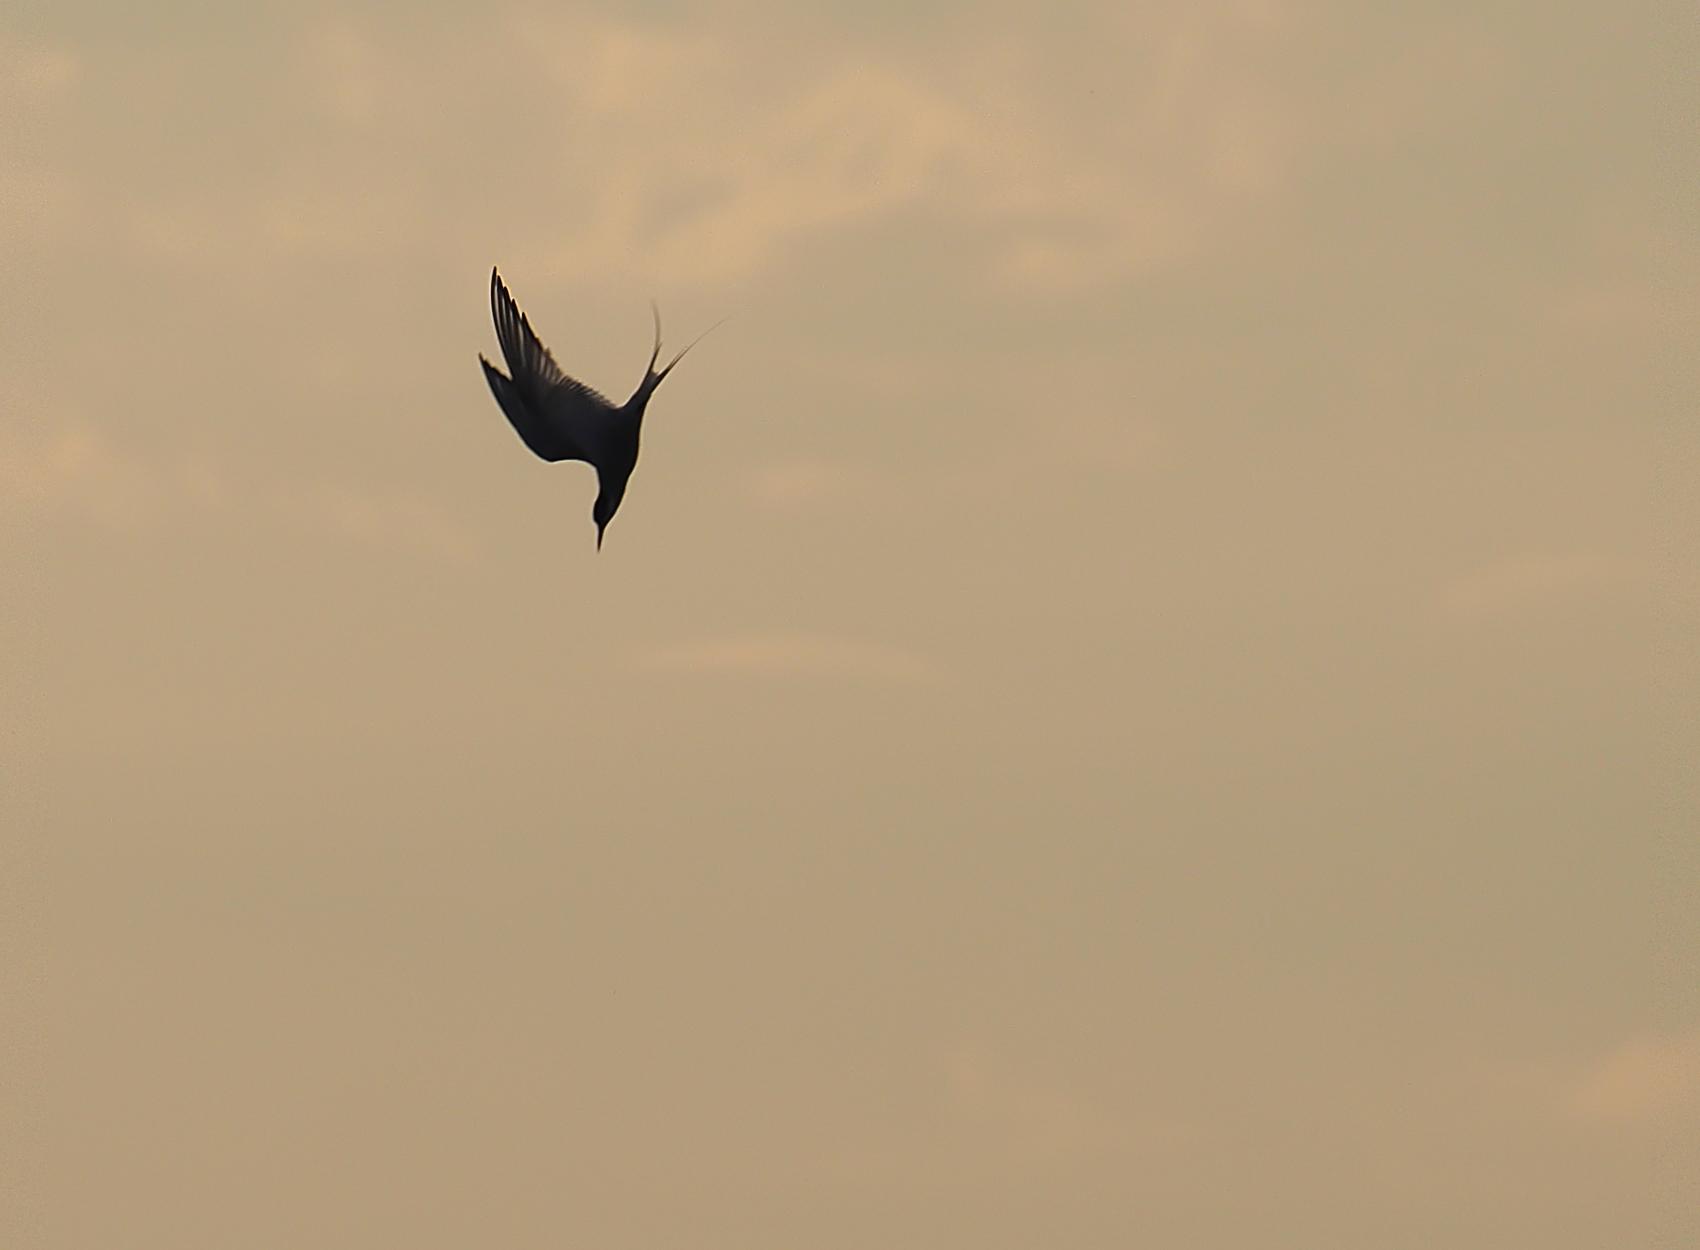 Flussseeschwalbe01 (Sterna hirundo)